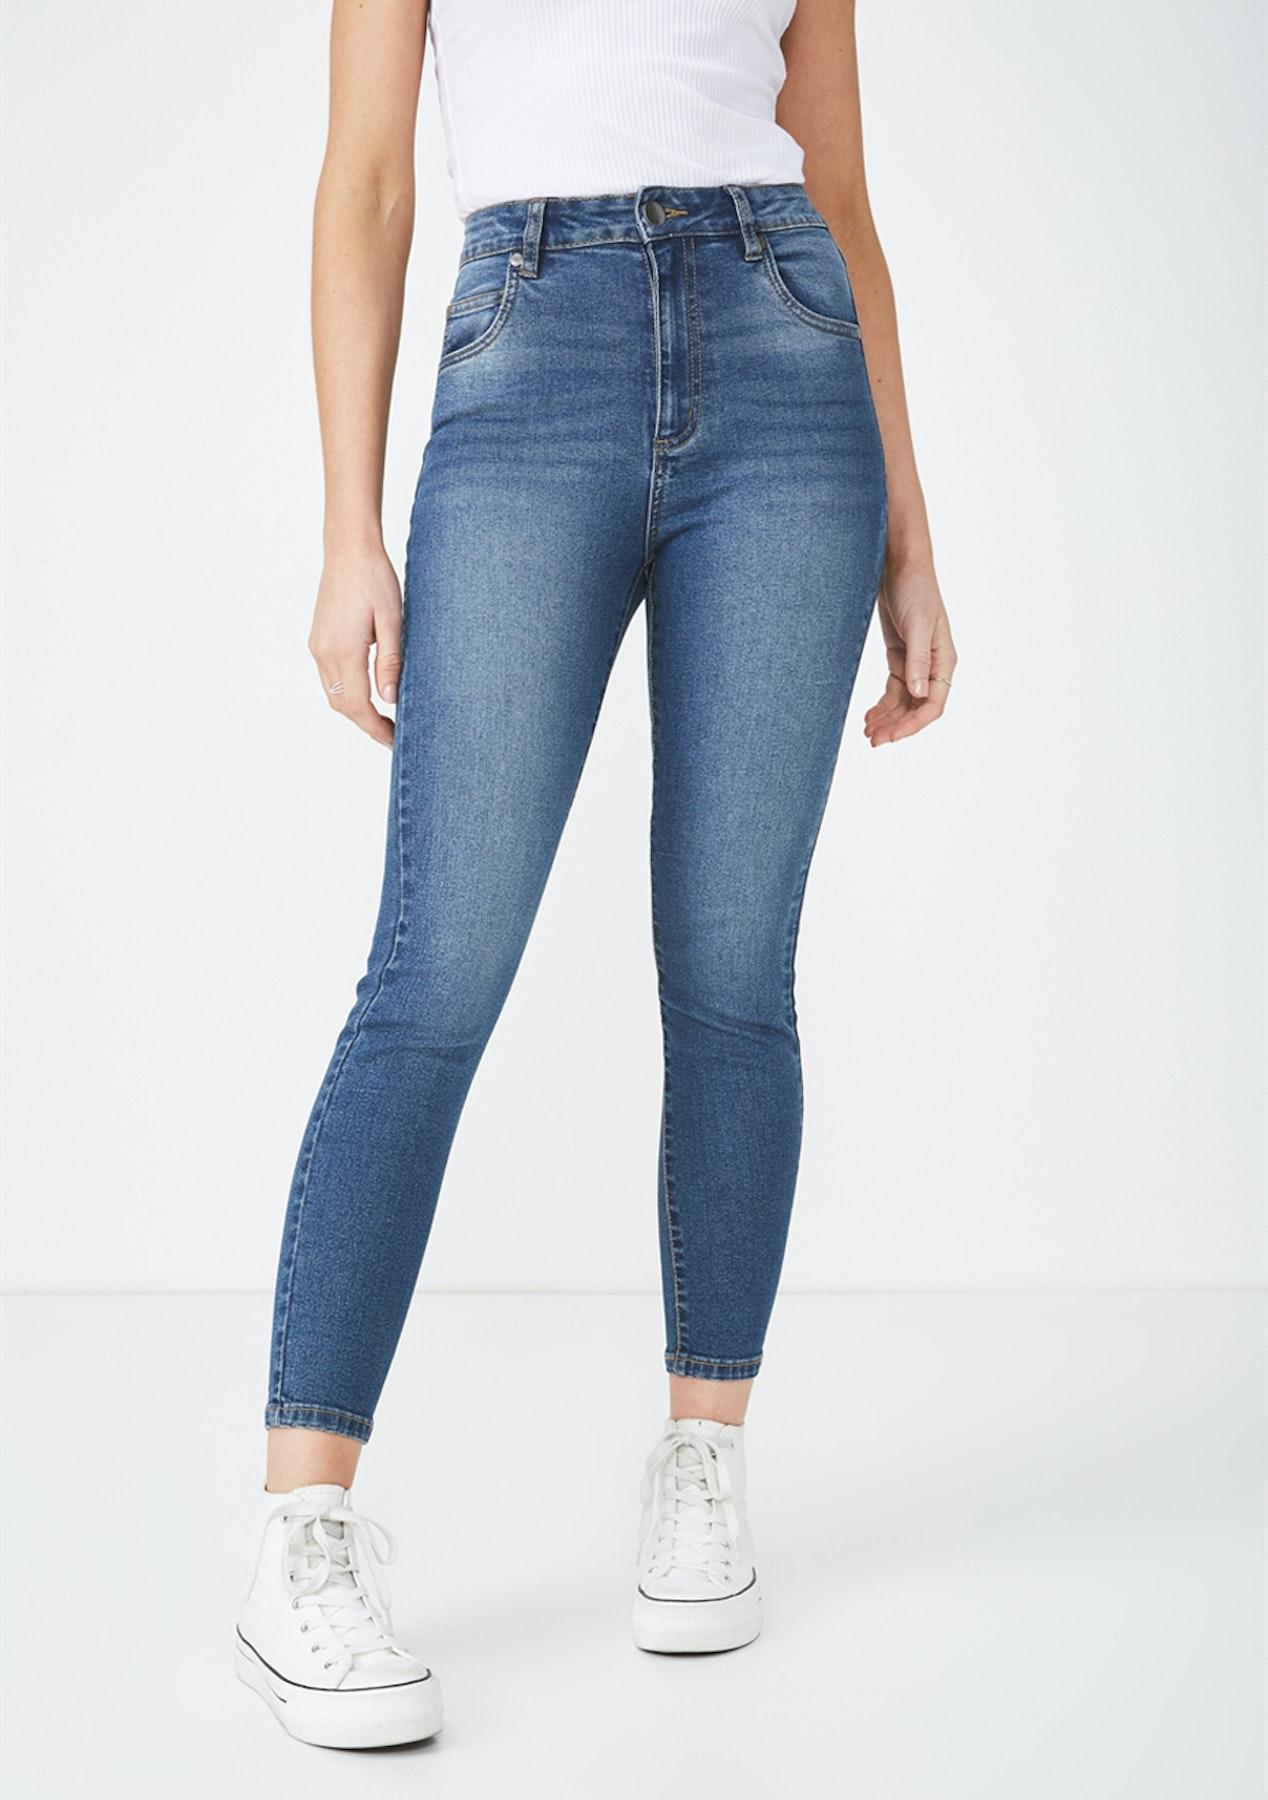 8bbc4110d3 Cotton On - High Rise Grazer Skinny Jean/True Stone Blue - Cotton On Winter  Basics! - Onceit